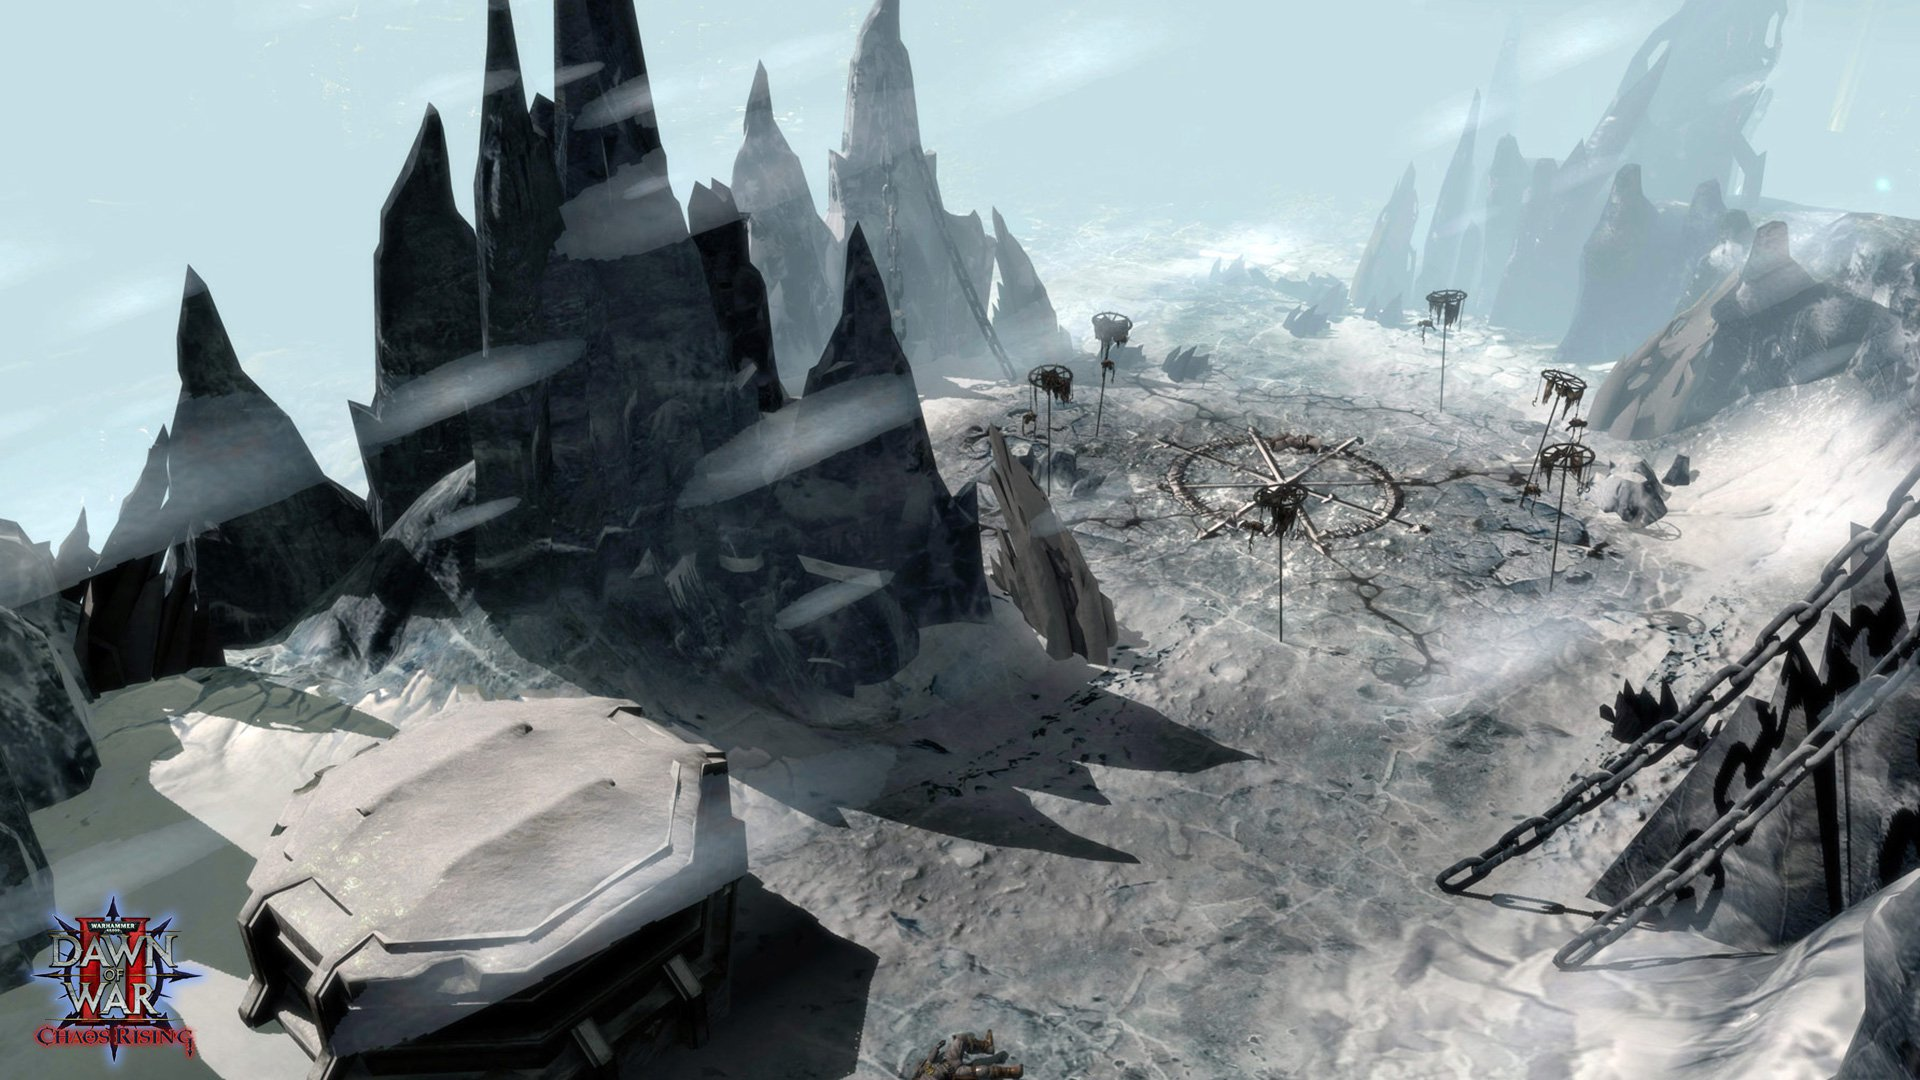 Warhammer 40,000 Dawn of War II Chaos Rising 6